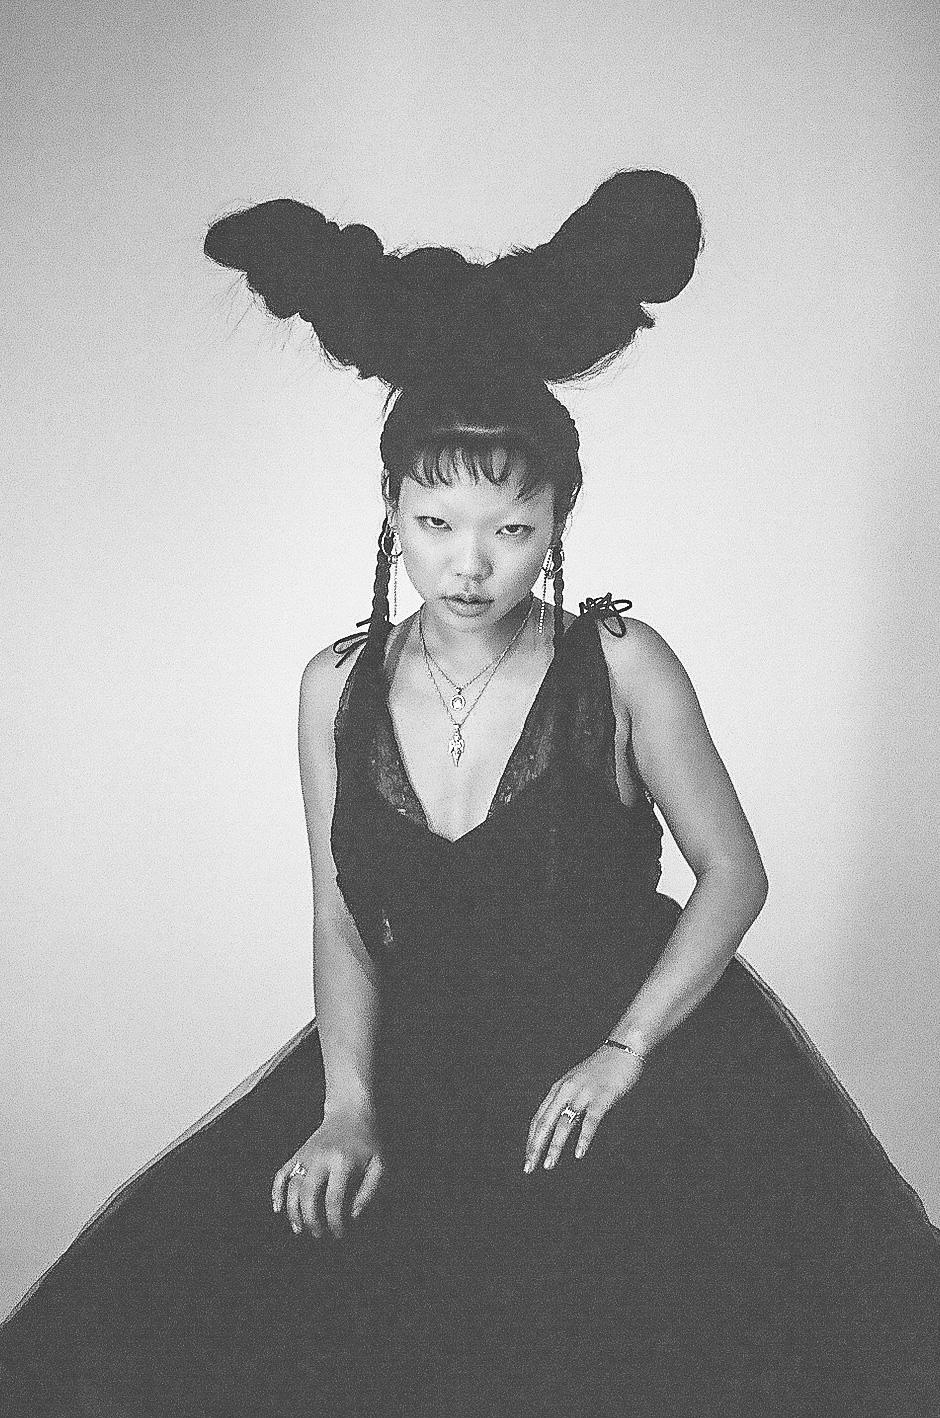 Josephine-Studio-Film-Beauty-GBY-bw-1-casenruiz.jpg